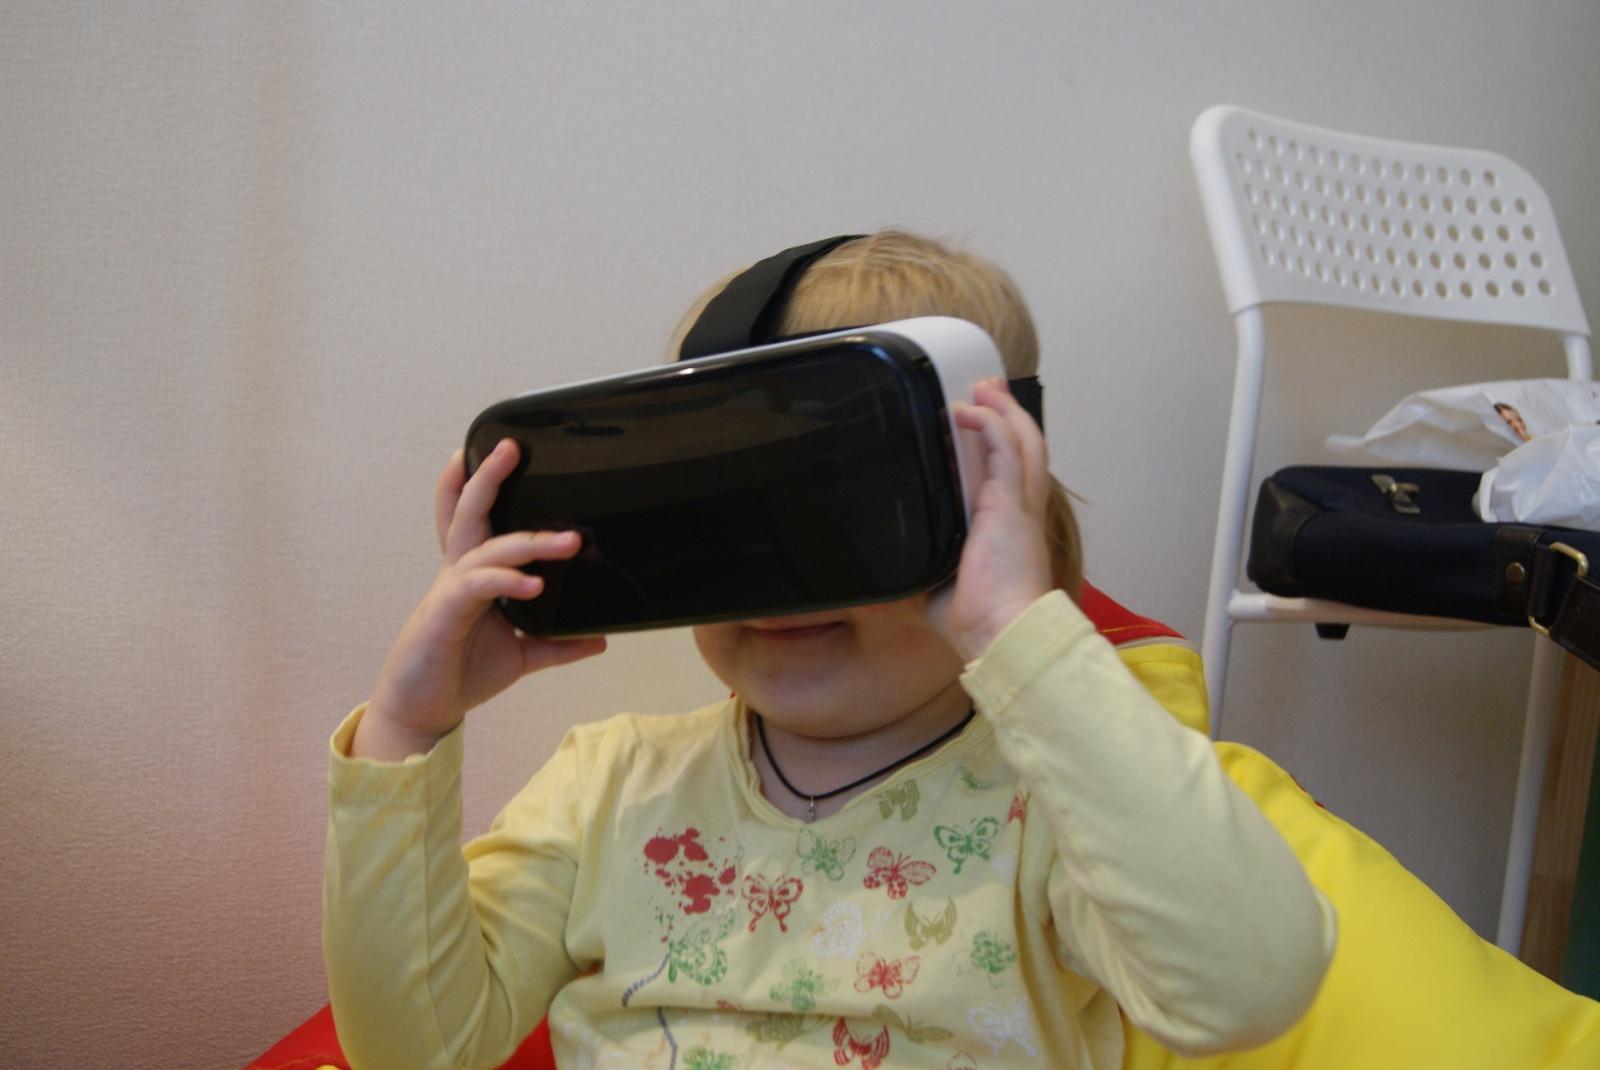 Обзор Alcatel IDOL 4S: виртуальная реальность из коробки - 25